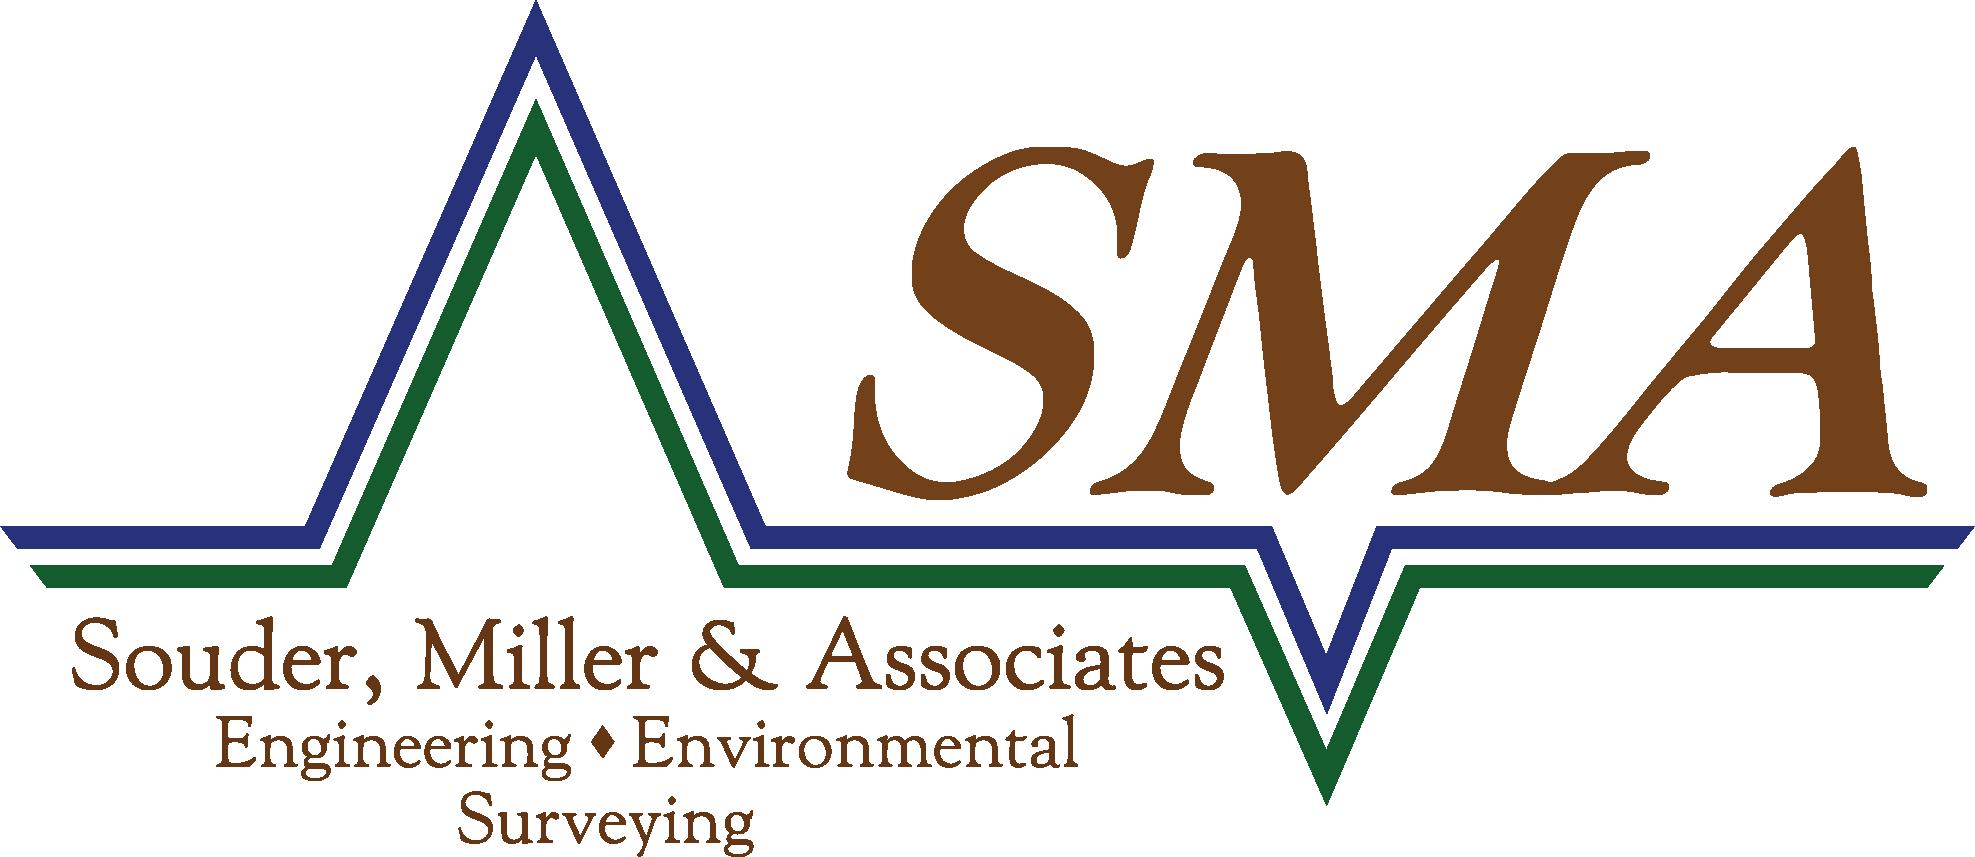 Souder, Miller & Associates